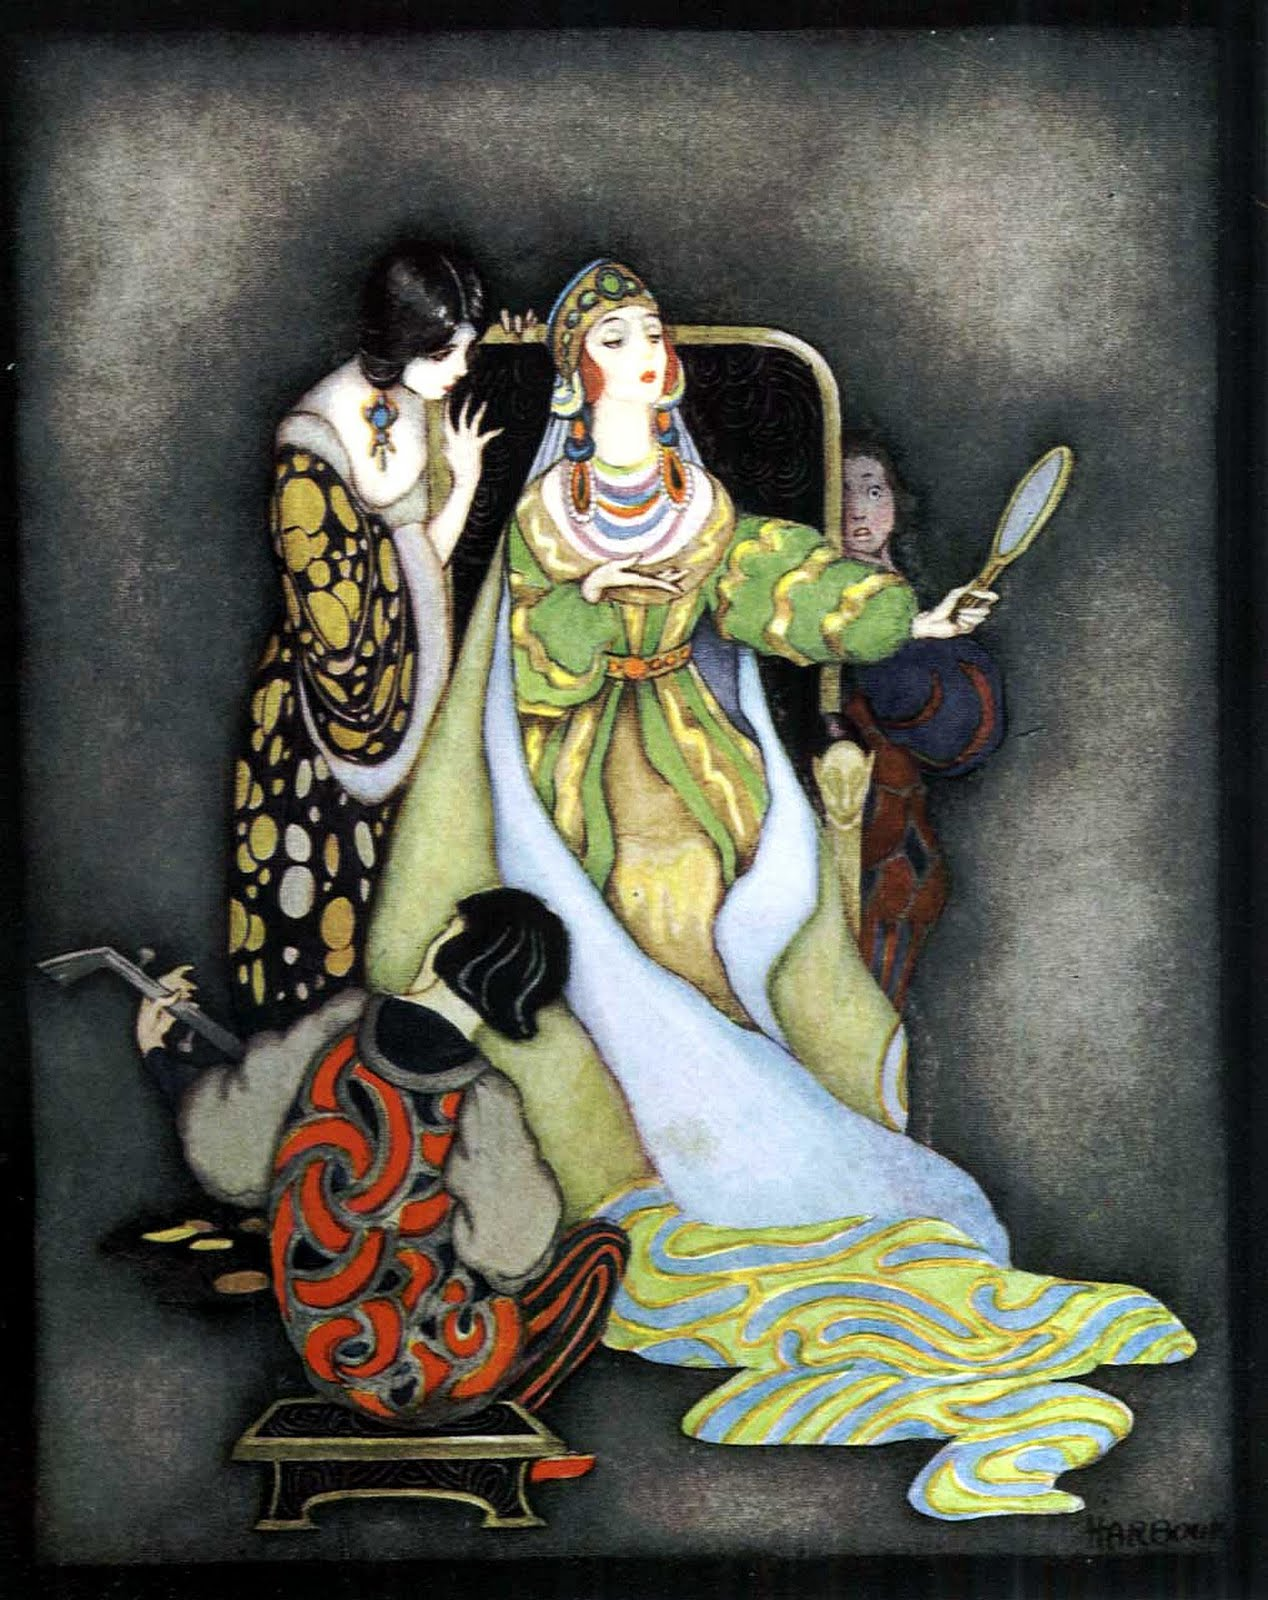 1 Vredenburg, Eric, editor. My Book of Favourite Fairy Tales. Jennie Harbour, illustrator. London Raphael Tuck _ Sons, 1921